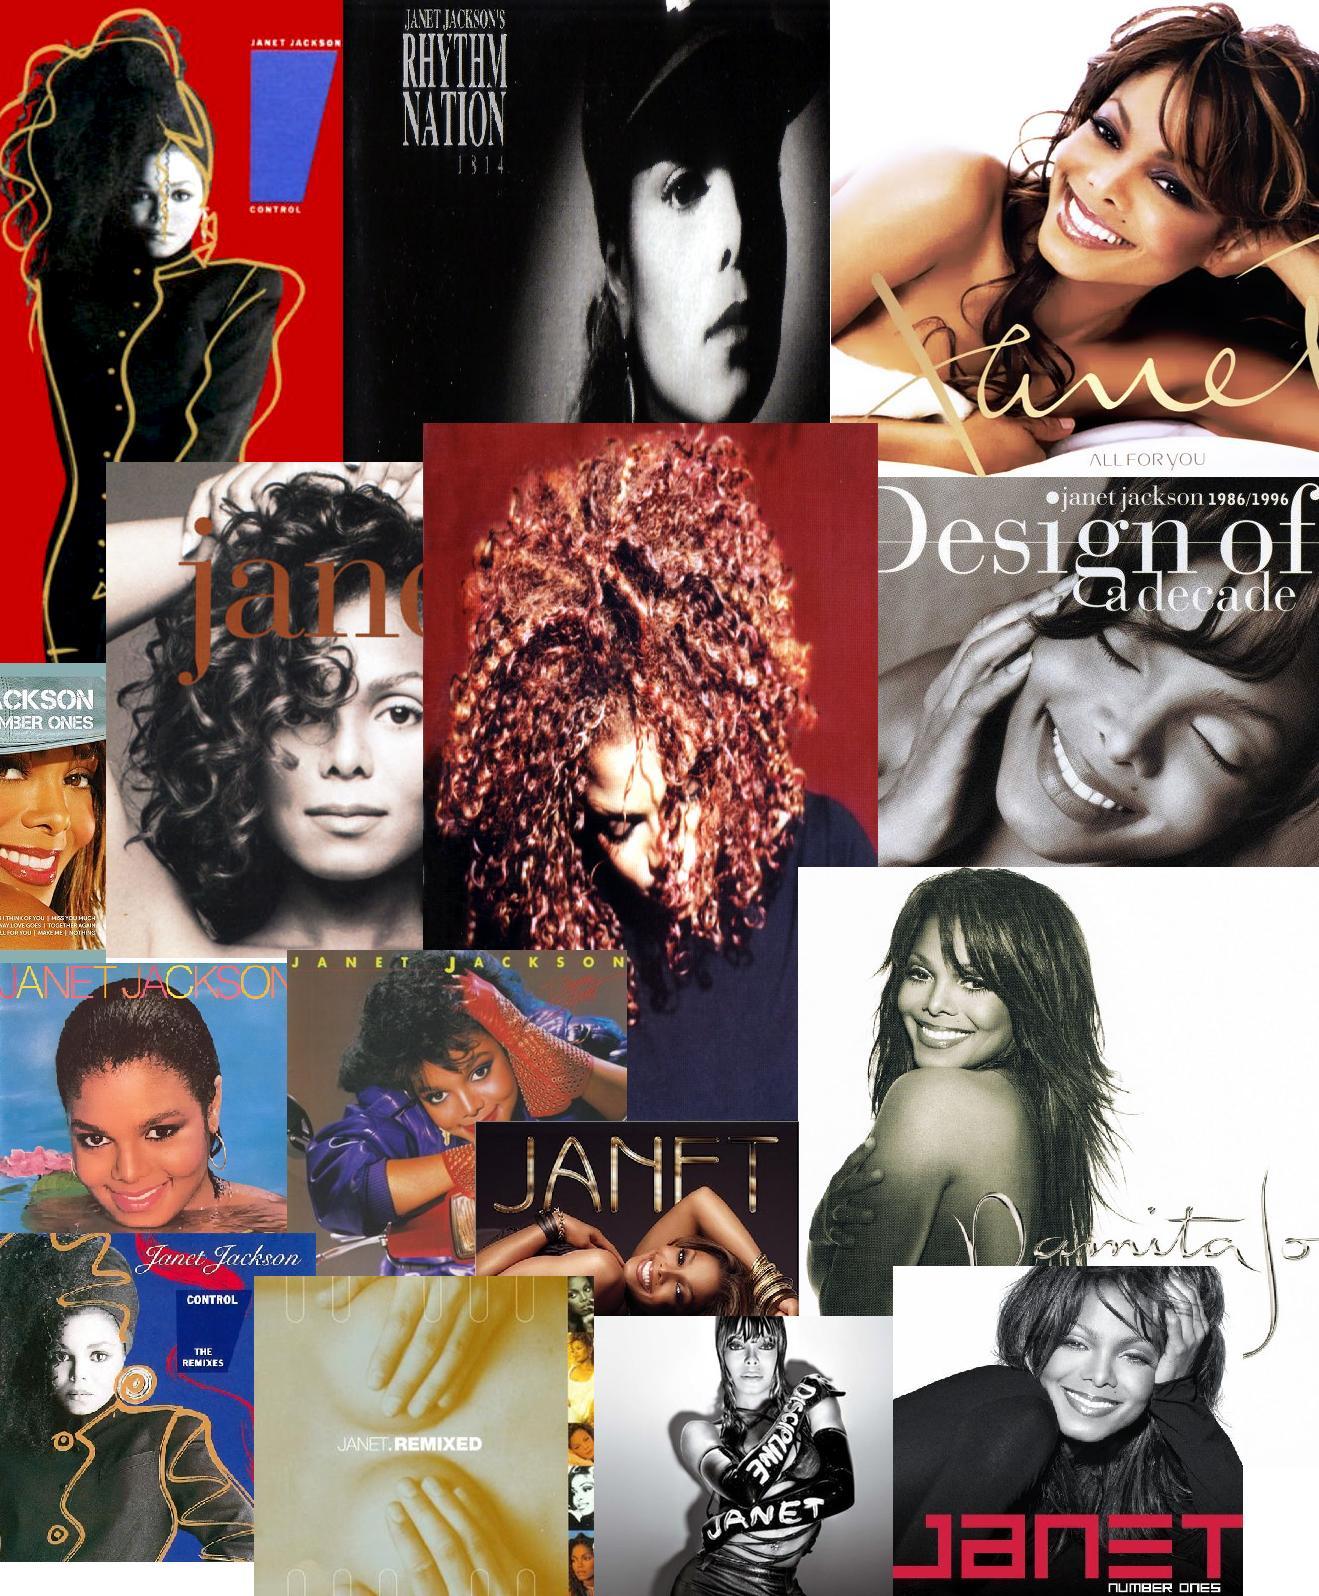 http://2.bp.blogspot.com/-arsRrfN4P70/UGT8KgSLXeI/AAAAAAAAM1U/WzY_qakSZP8/s1600/janet+30+years+Albums.jpg